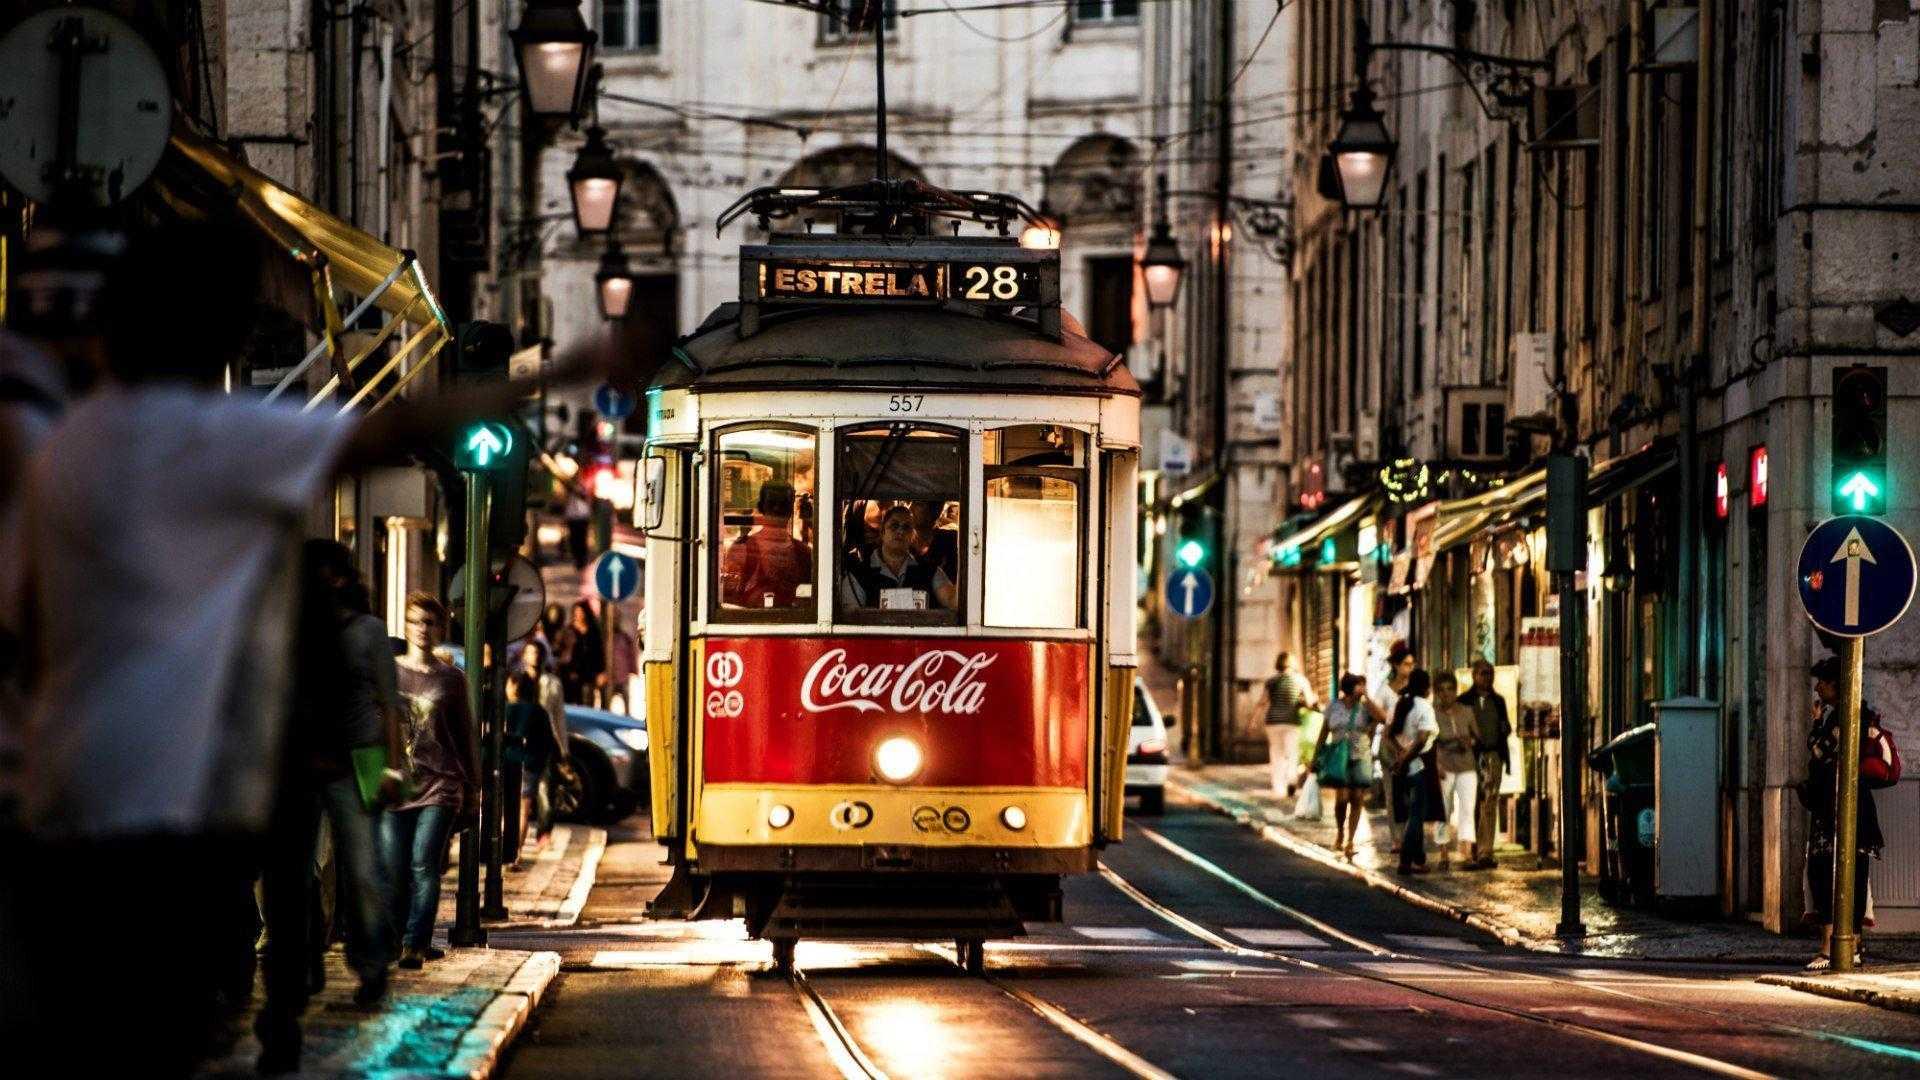 Cities_Tram_in_Lisbon__Portugal_094297_Web Summit